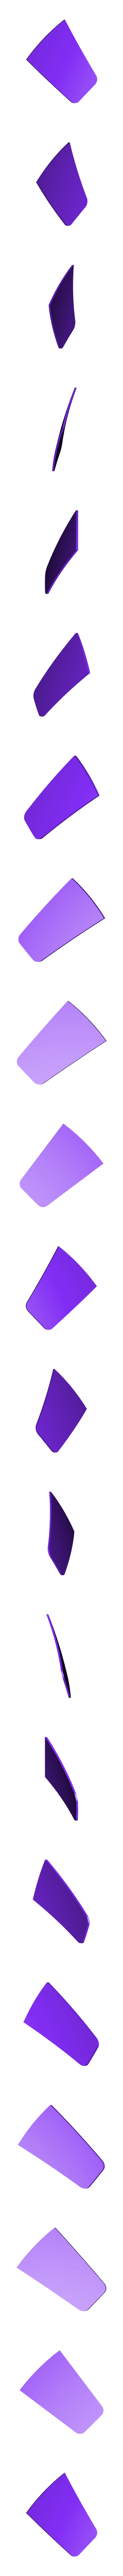 waike2.STL Download free STL file BB-8 • 3D printable template, 3DP_PARK